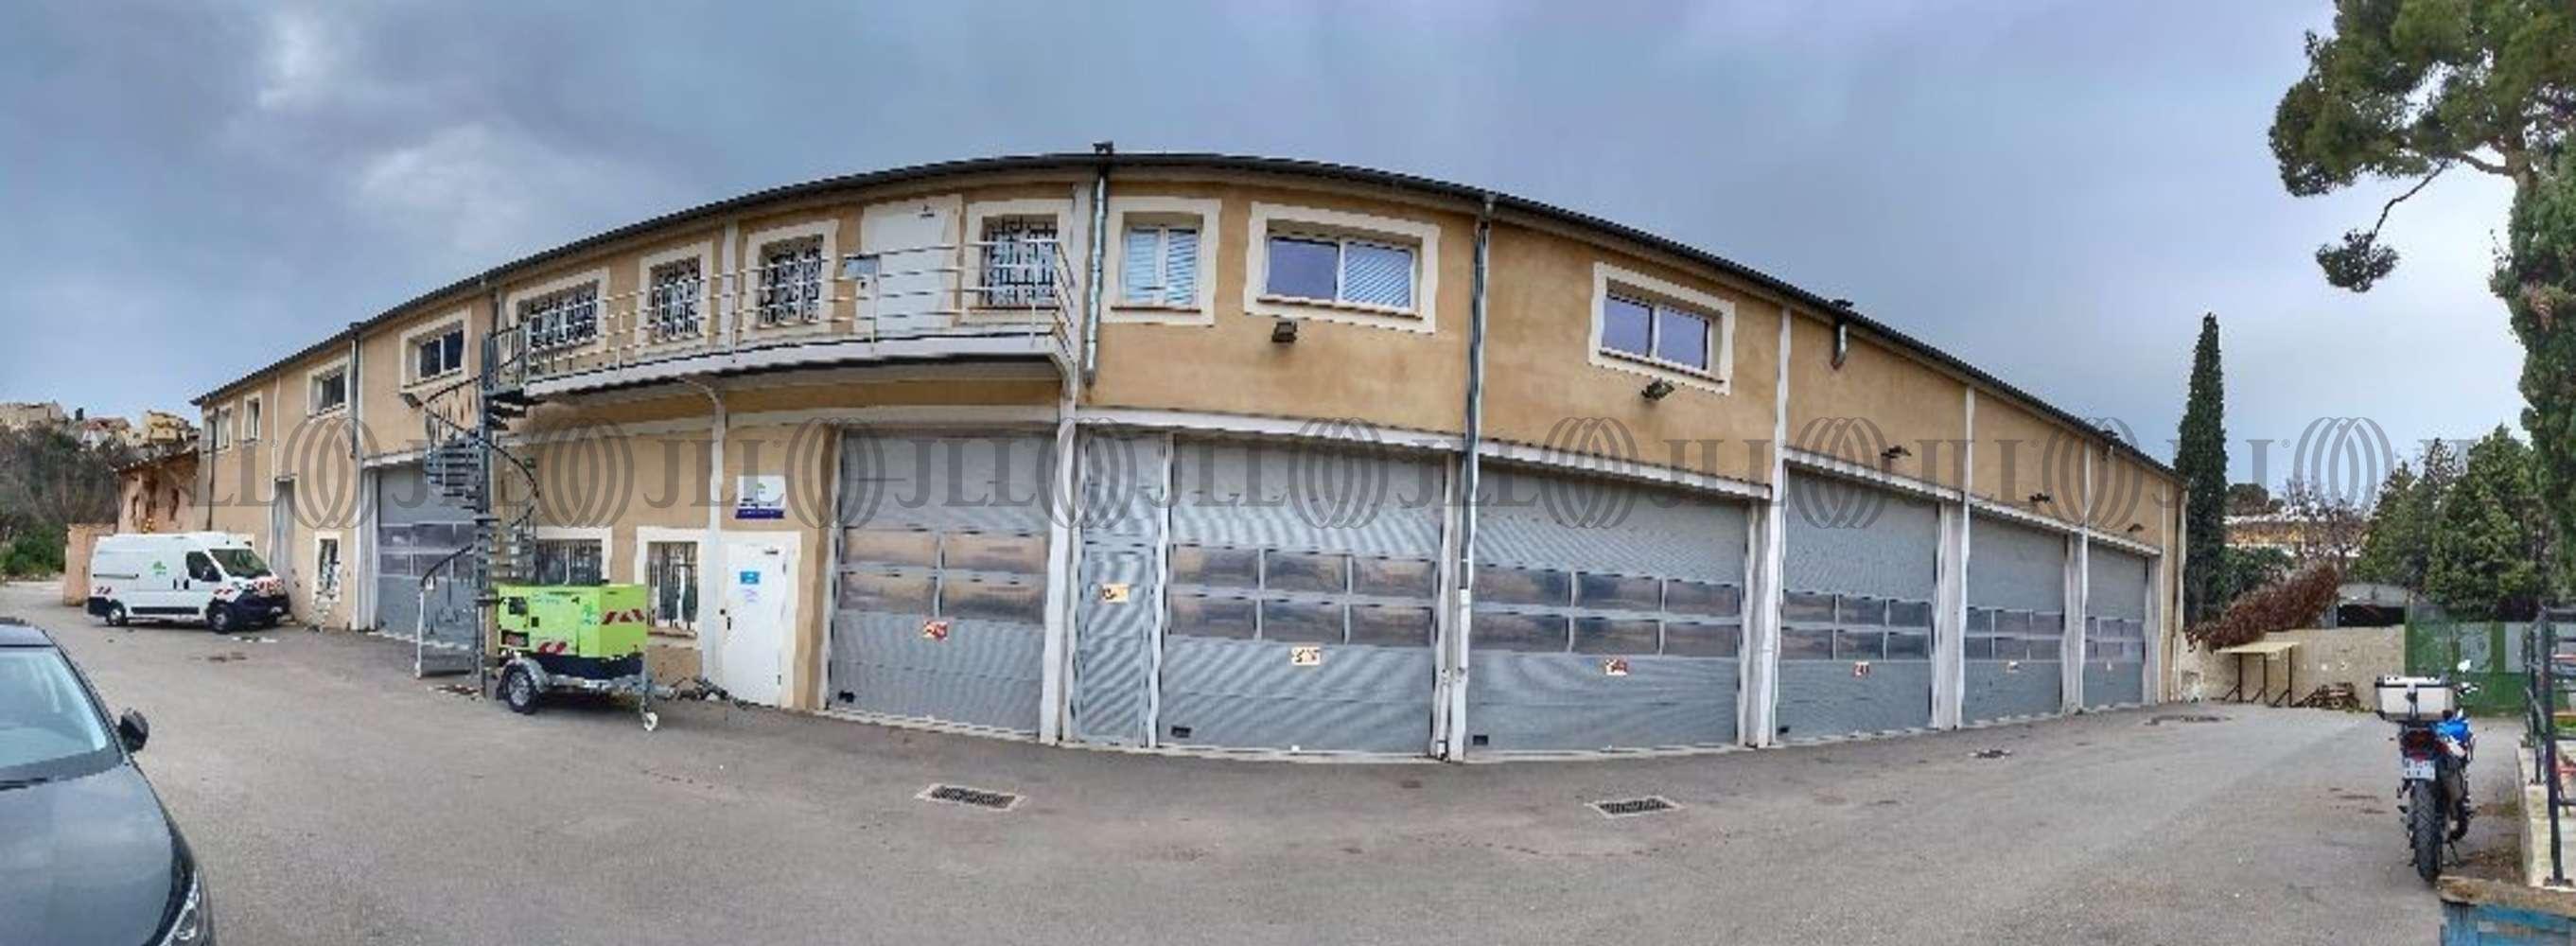 Activités/entrepôt Marseille, 13015 -  TRAVERSE SANTI - 10920983